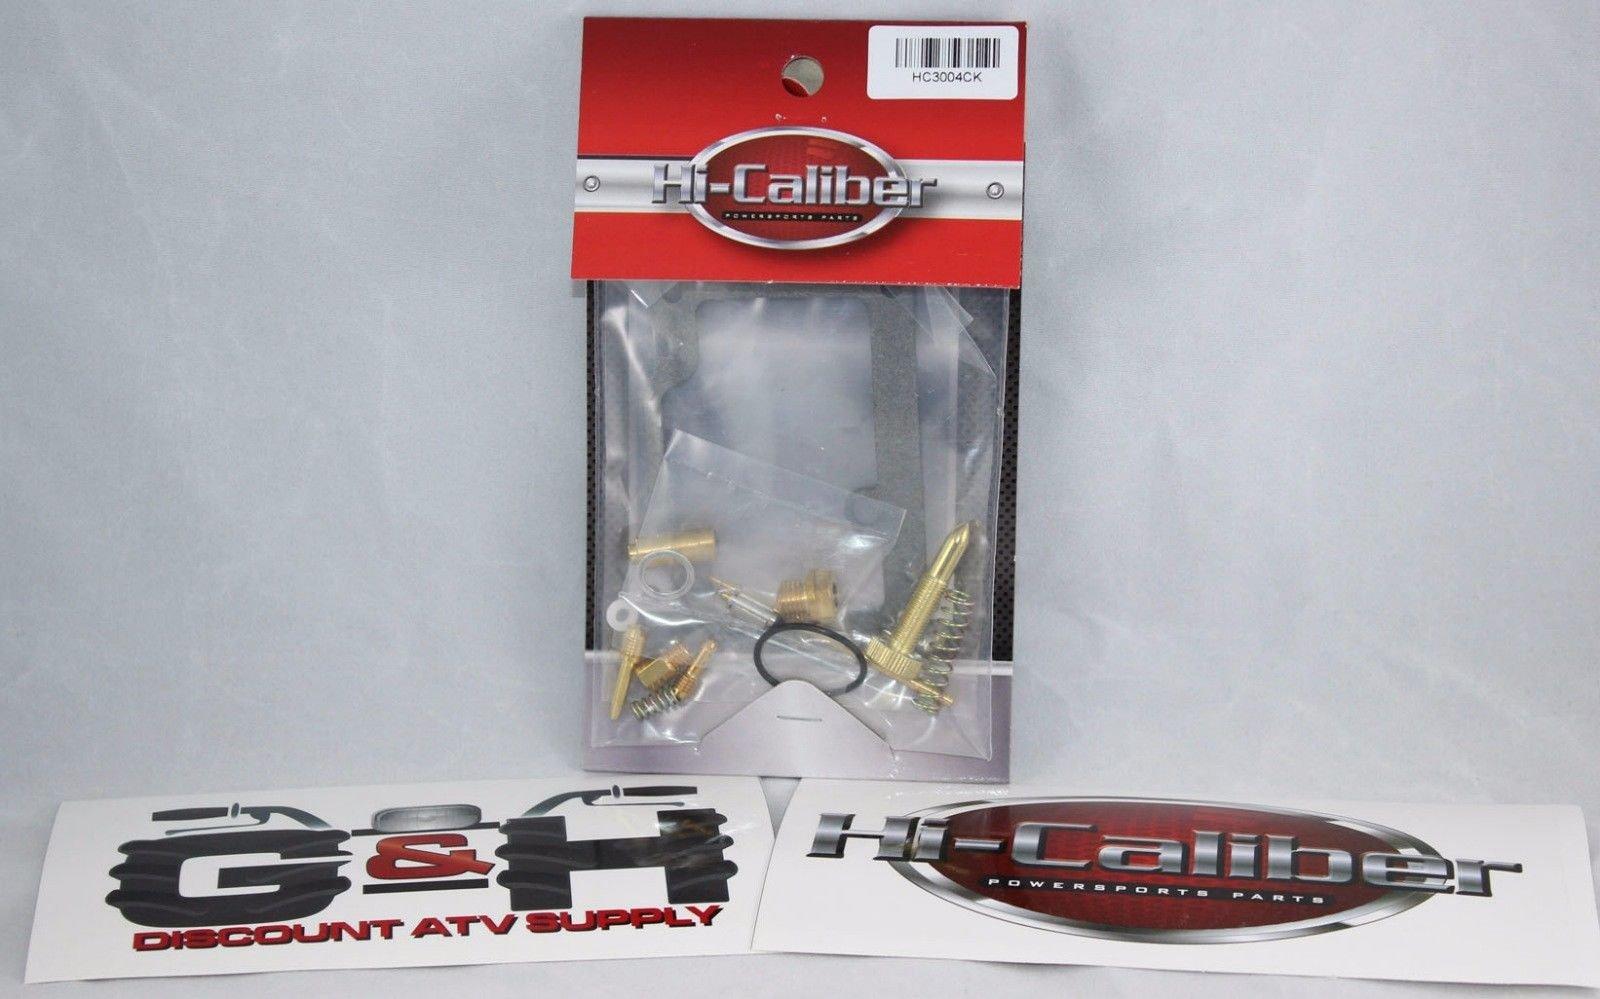 NEW QUALITY 1996-1997 Polaris 400L Sport Carburetor Rebuild Kit